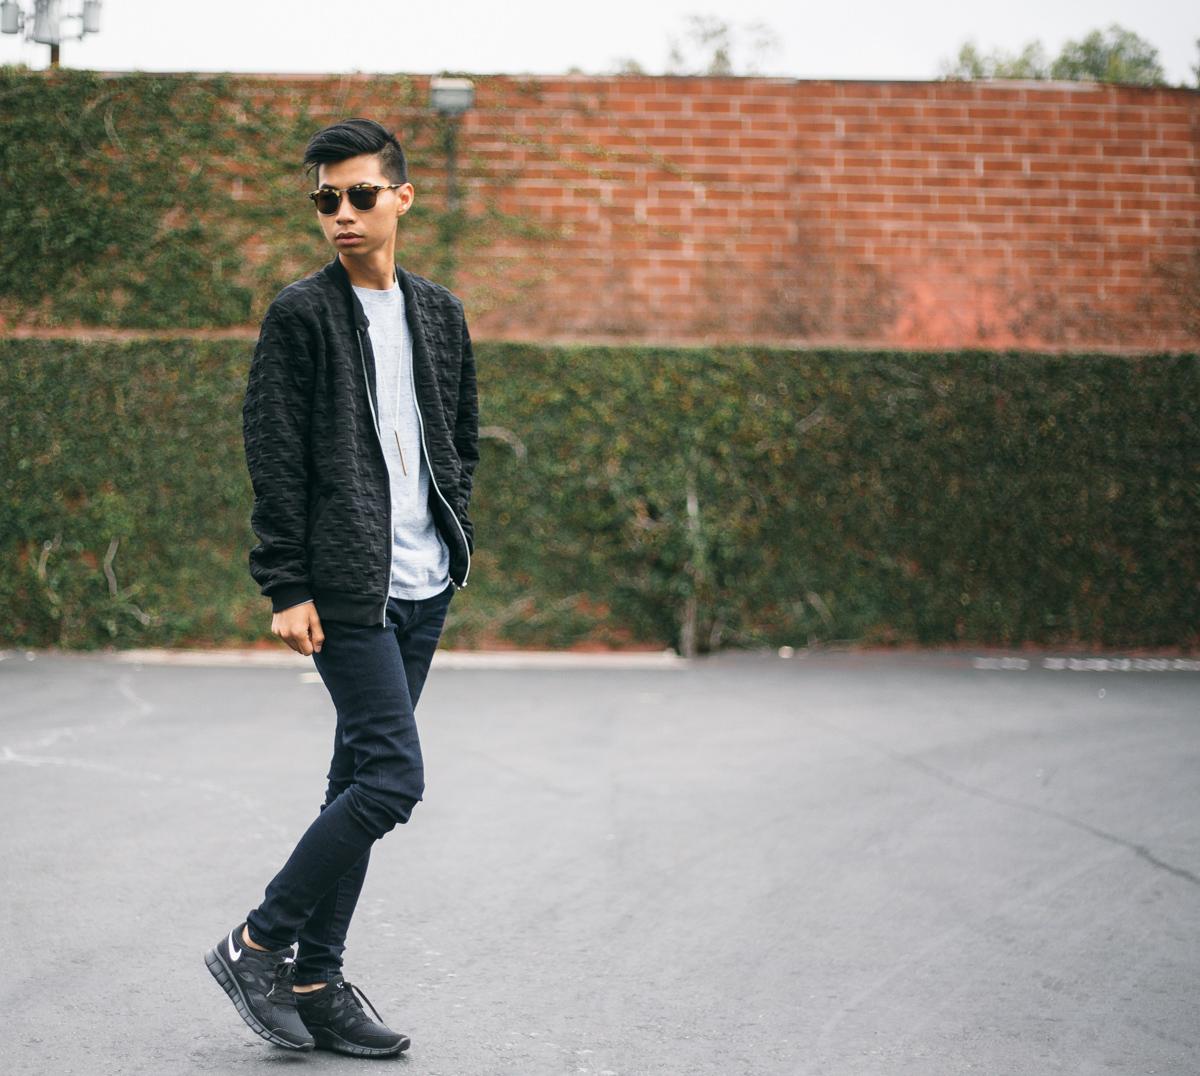 mybelonging-tommylei-menswearblogger-jdsports-nike-trainers-boohooman-tomford-sunglasses-11.jpg